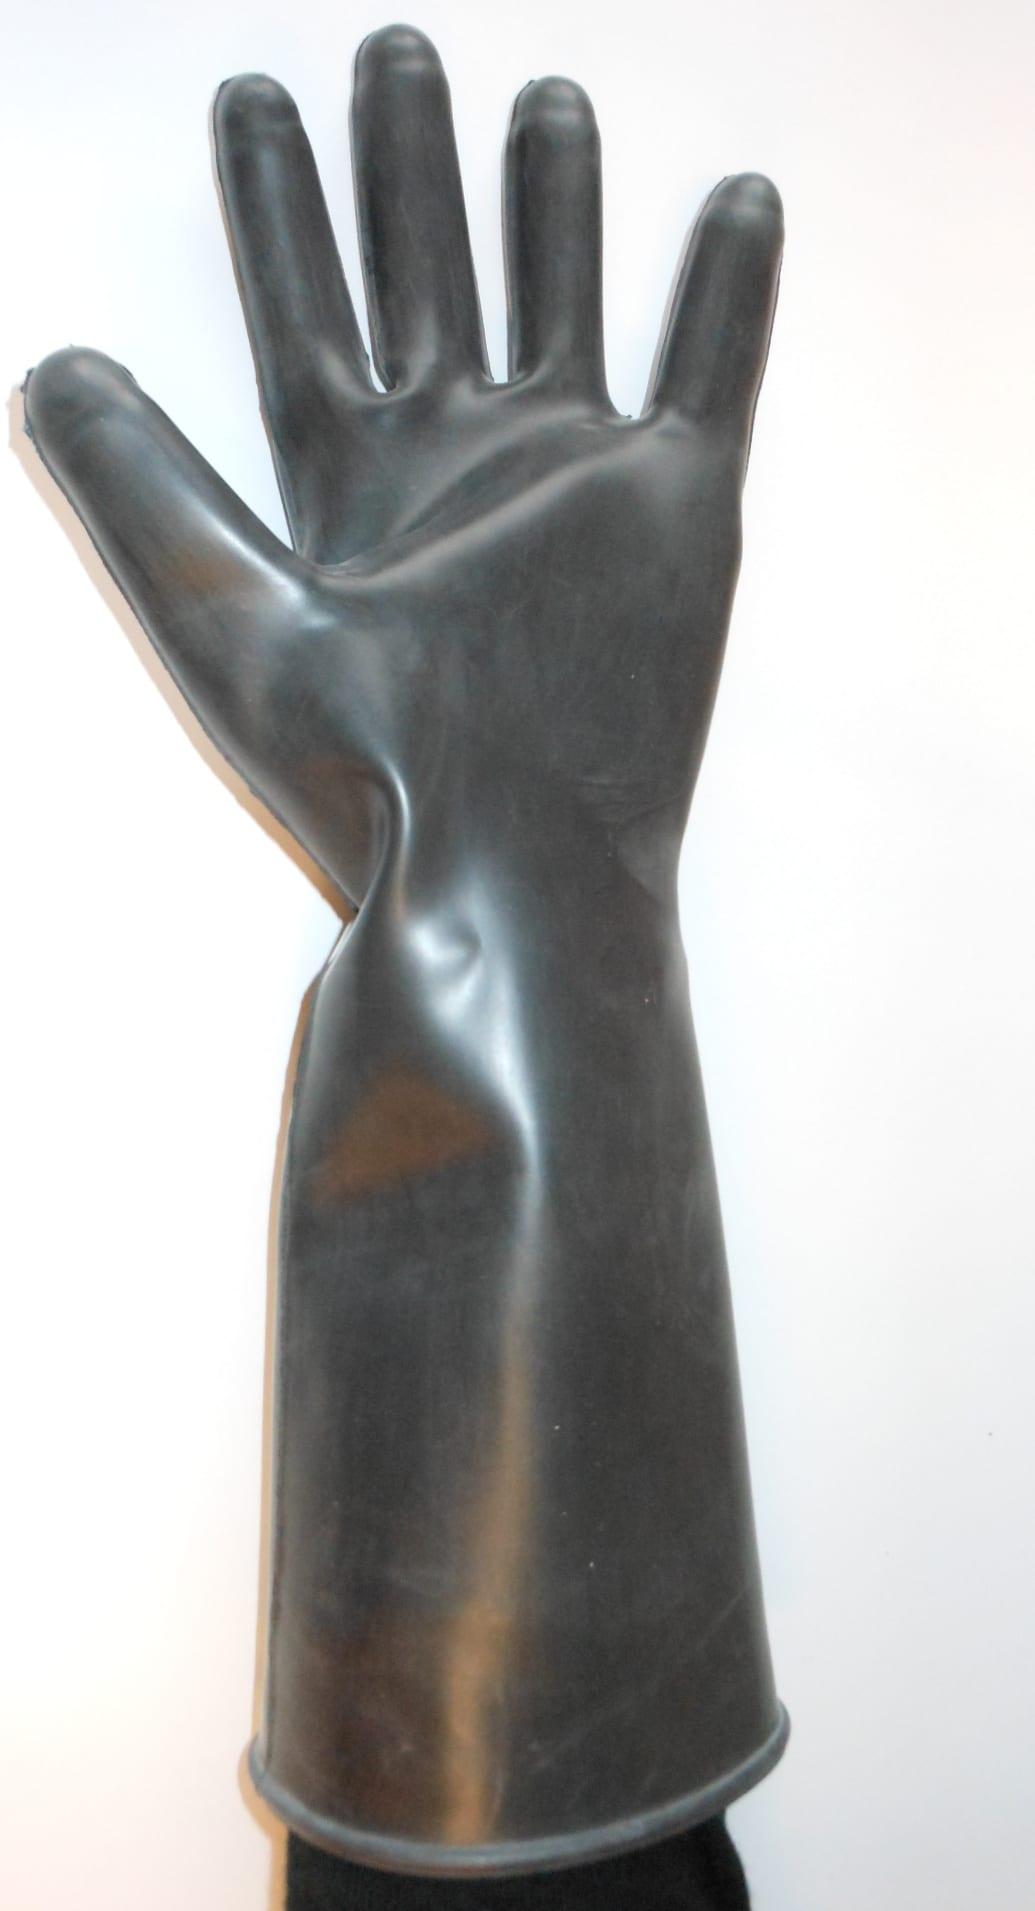 CBRN Butyl gloves